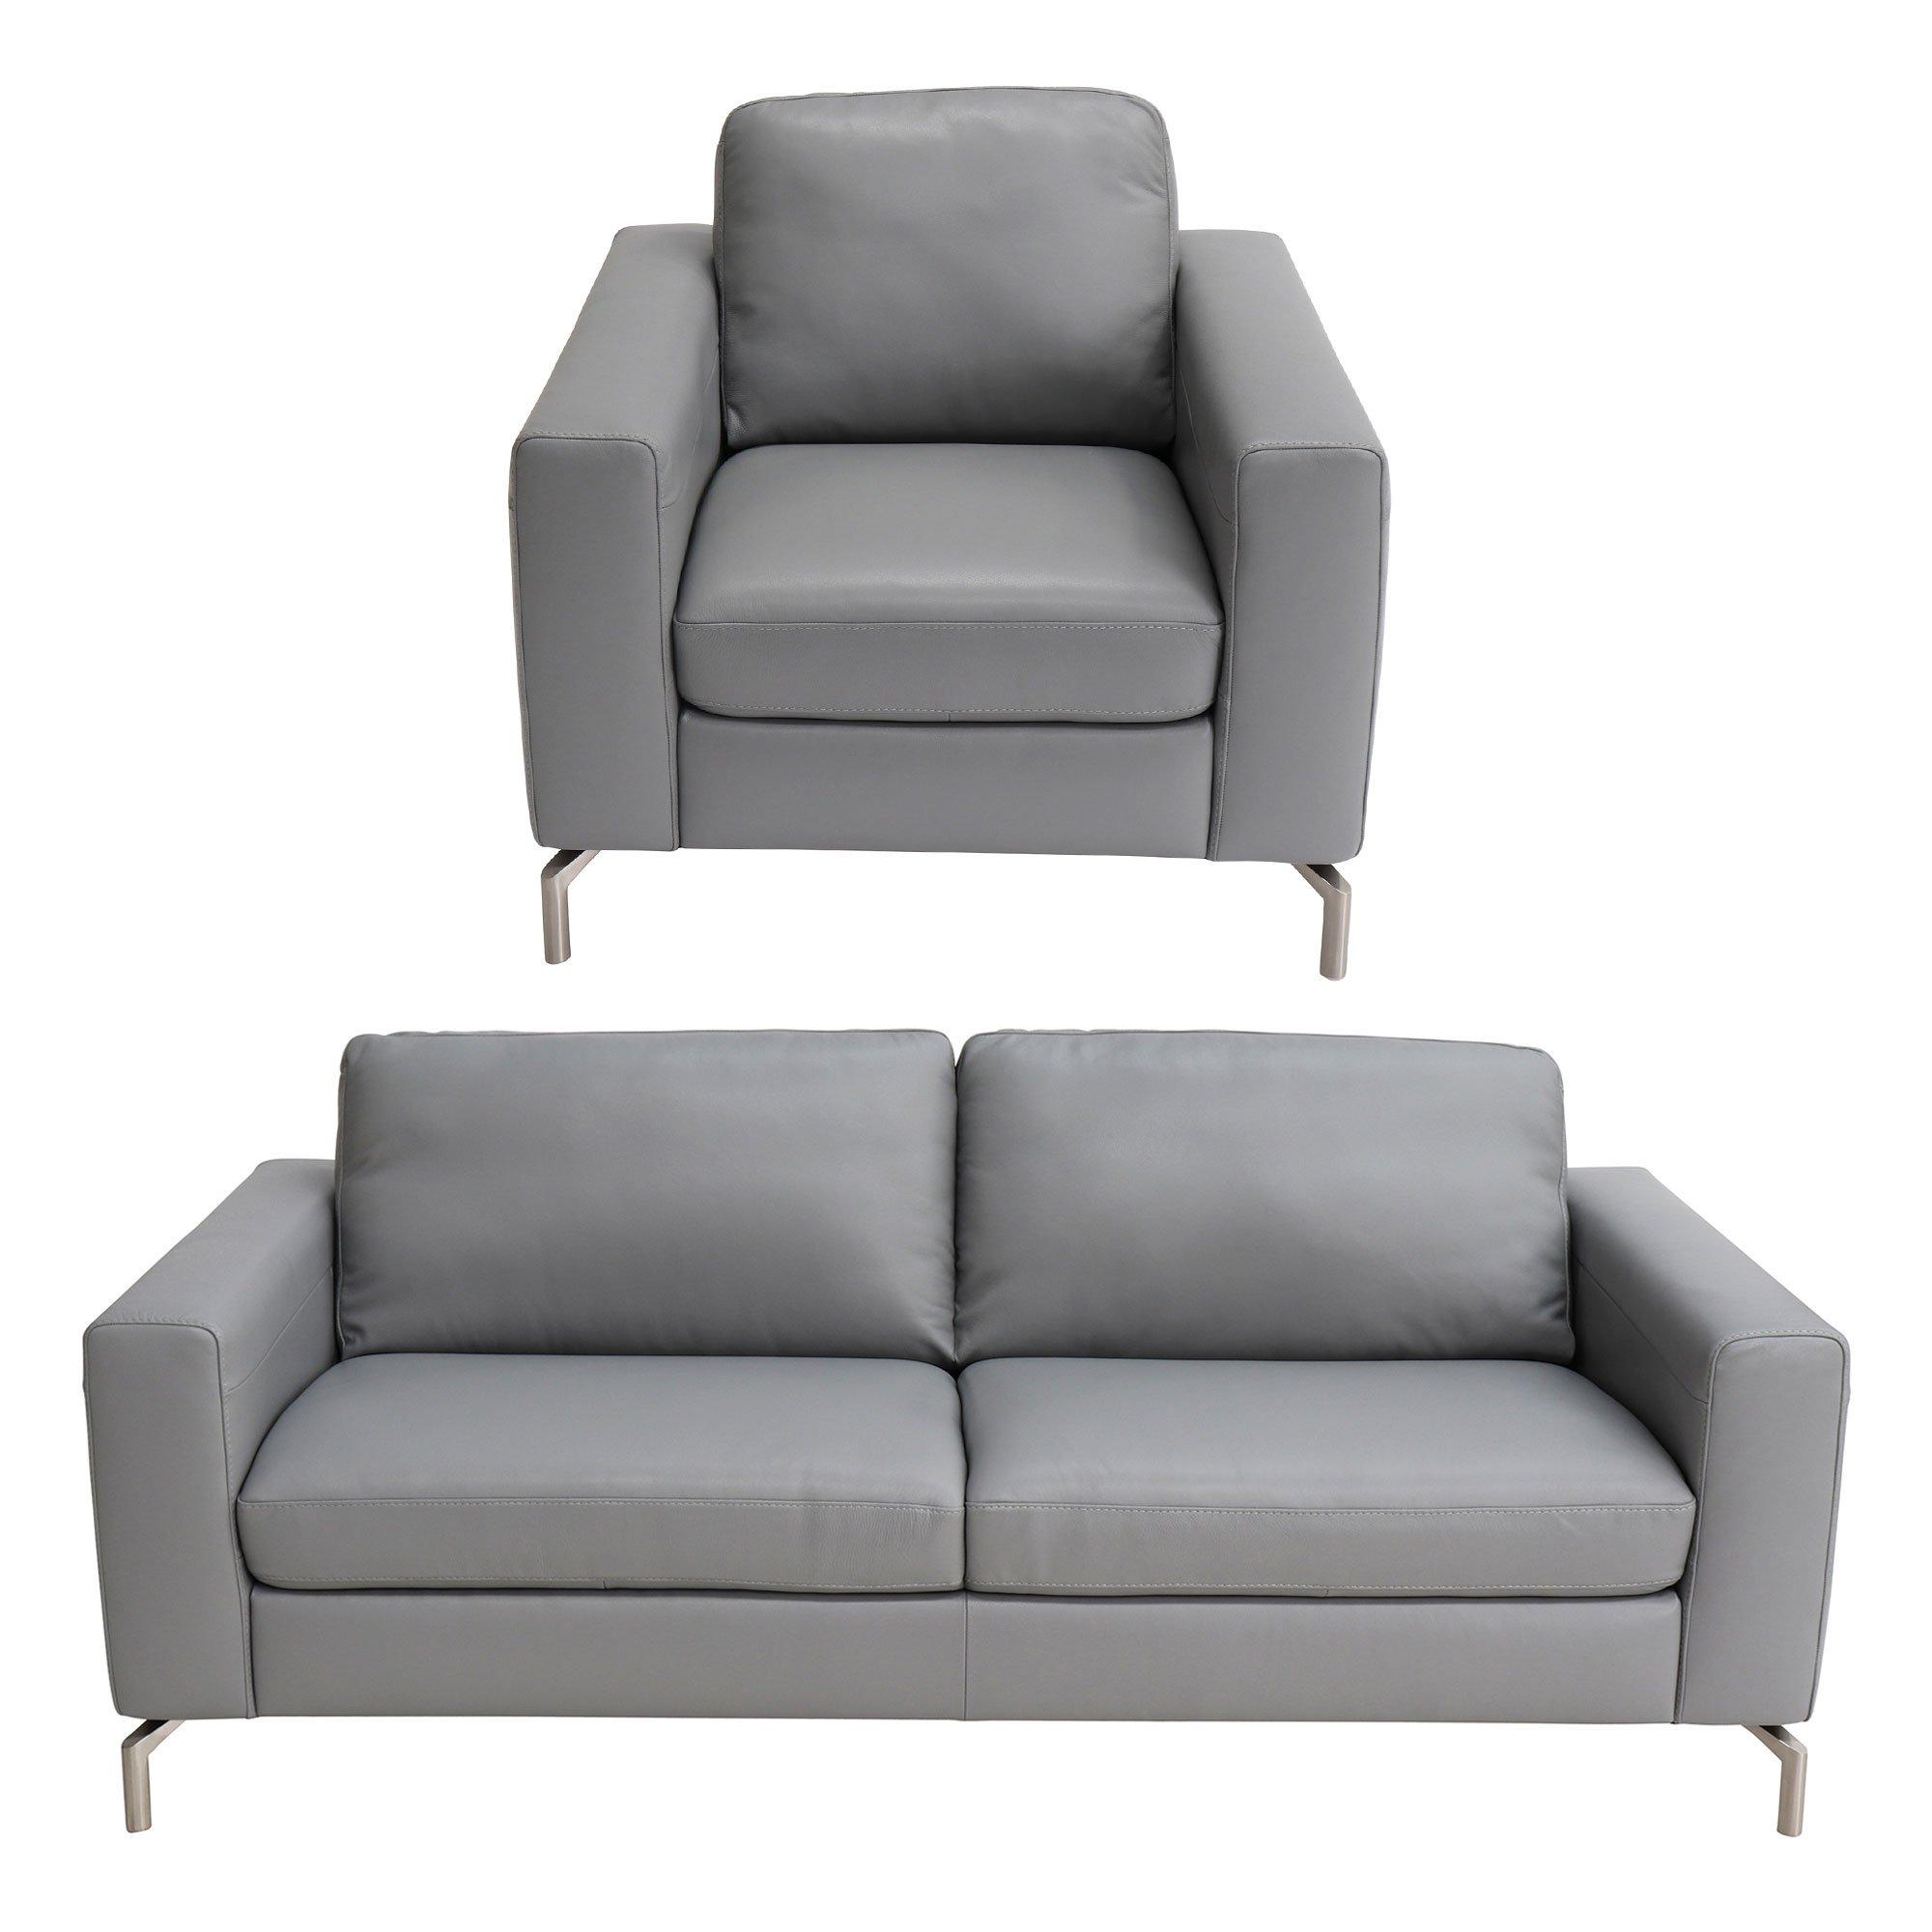 Natuzzi Editions Milano Grey Leather 3 Seater Sofa Armchair